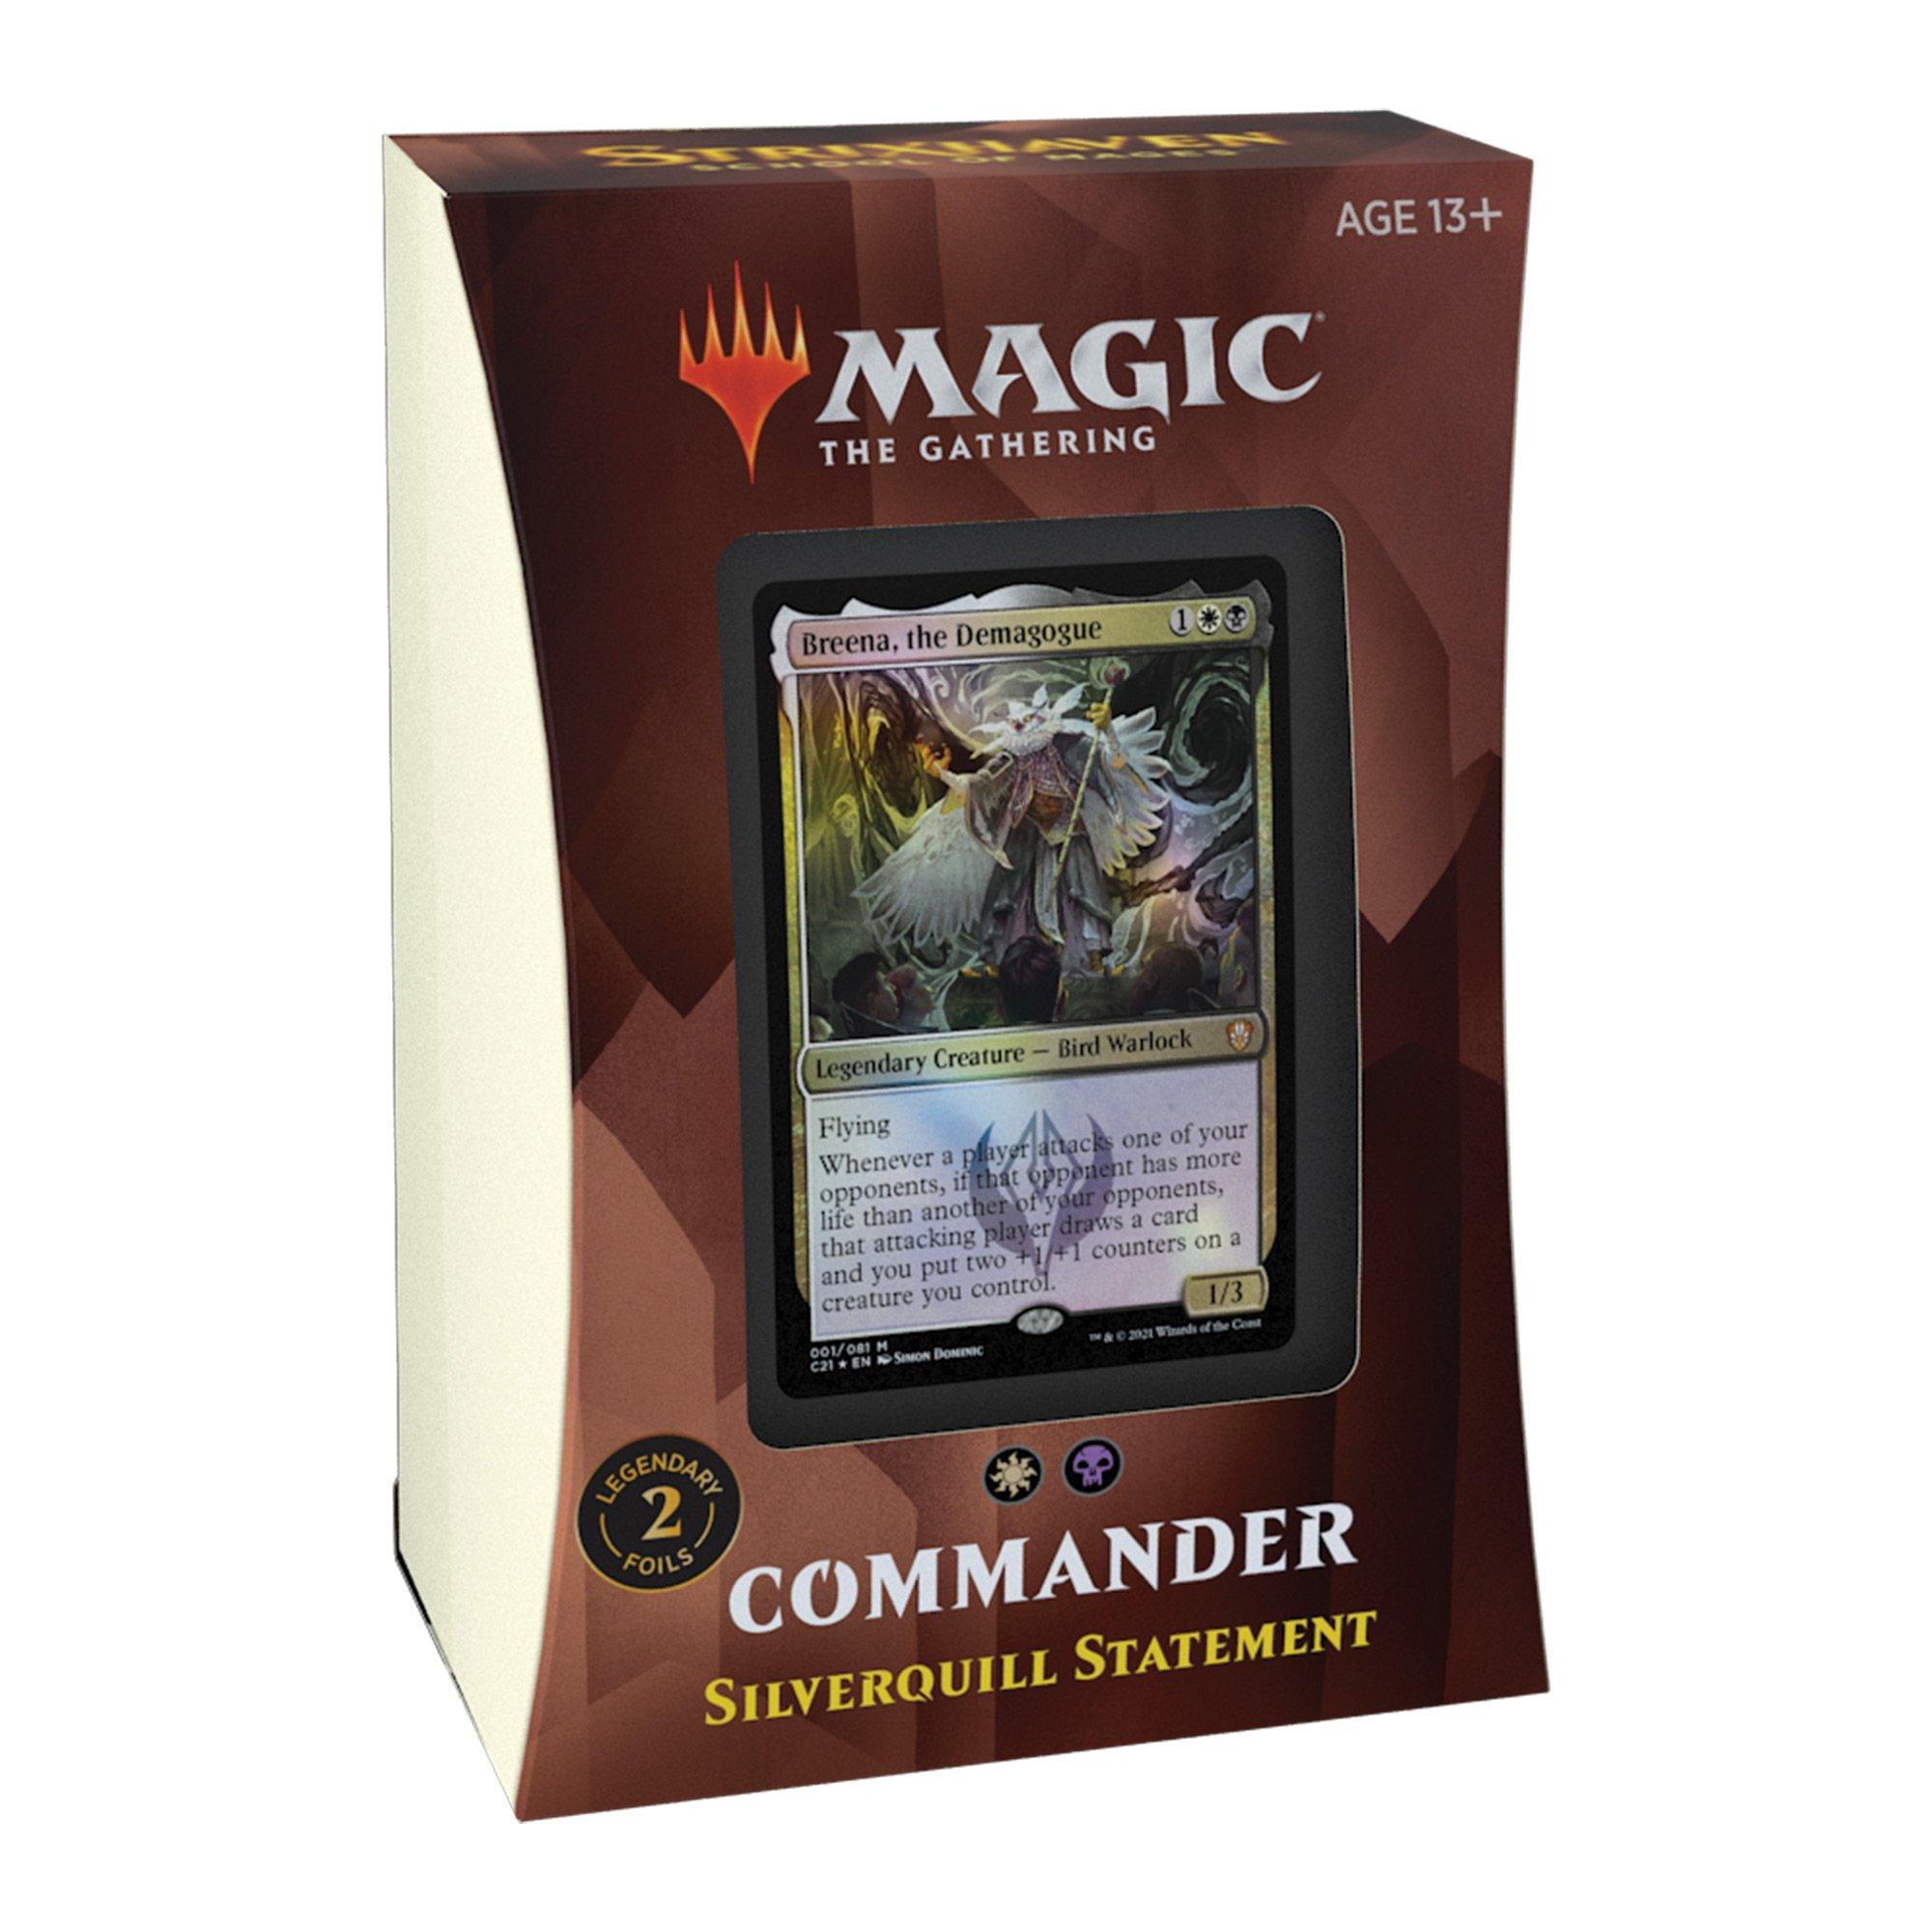 Strixhaven Commander Deck: Silverquill Statement LIMIT 2 PER CUSTOMER